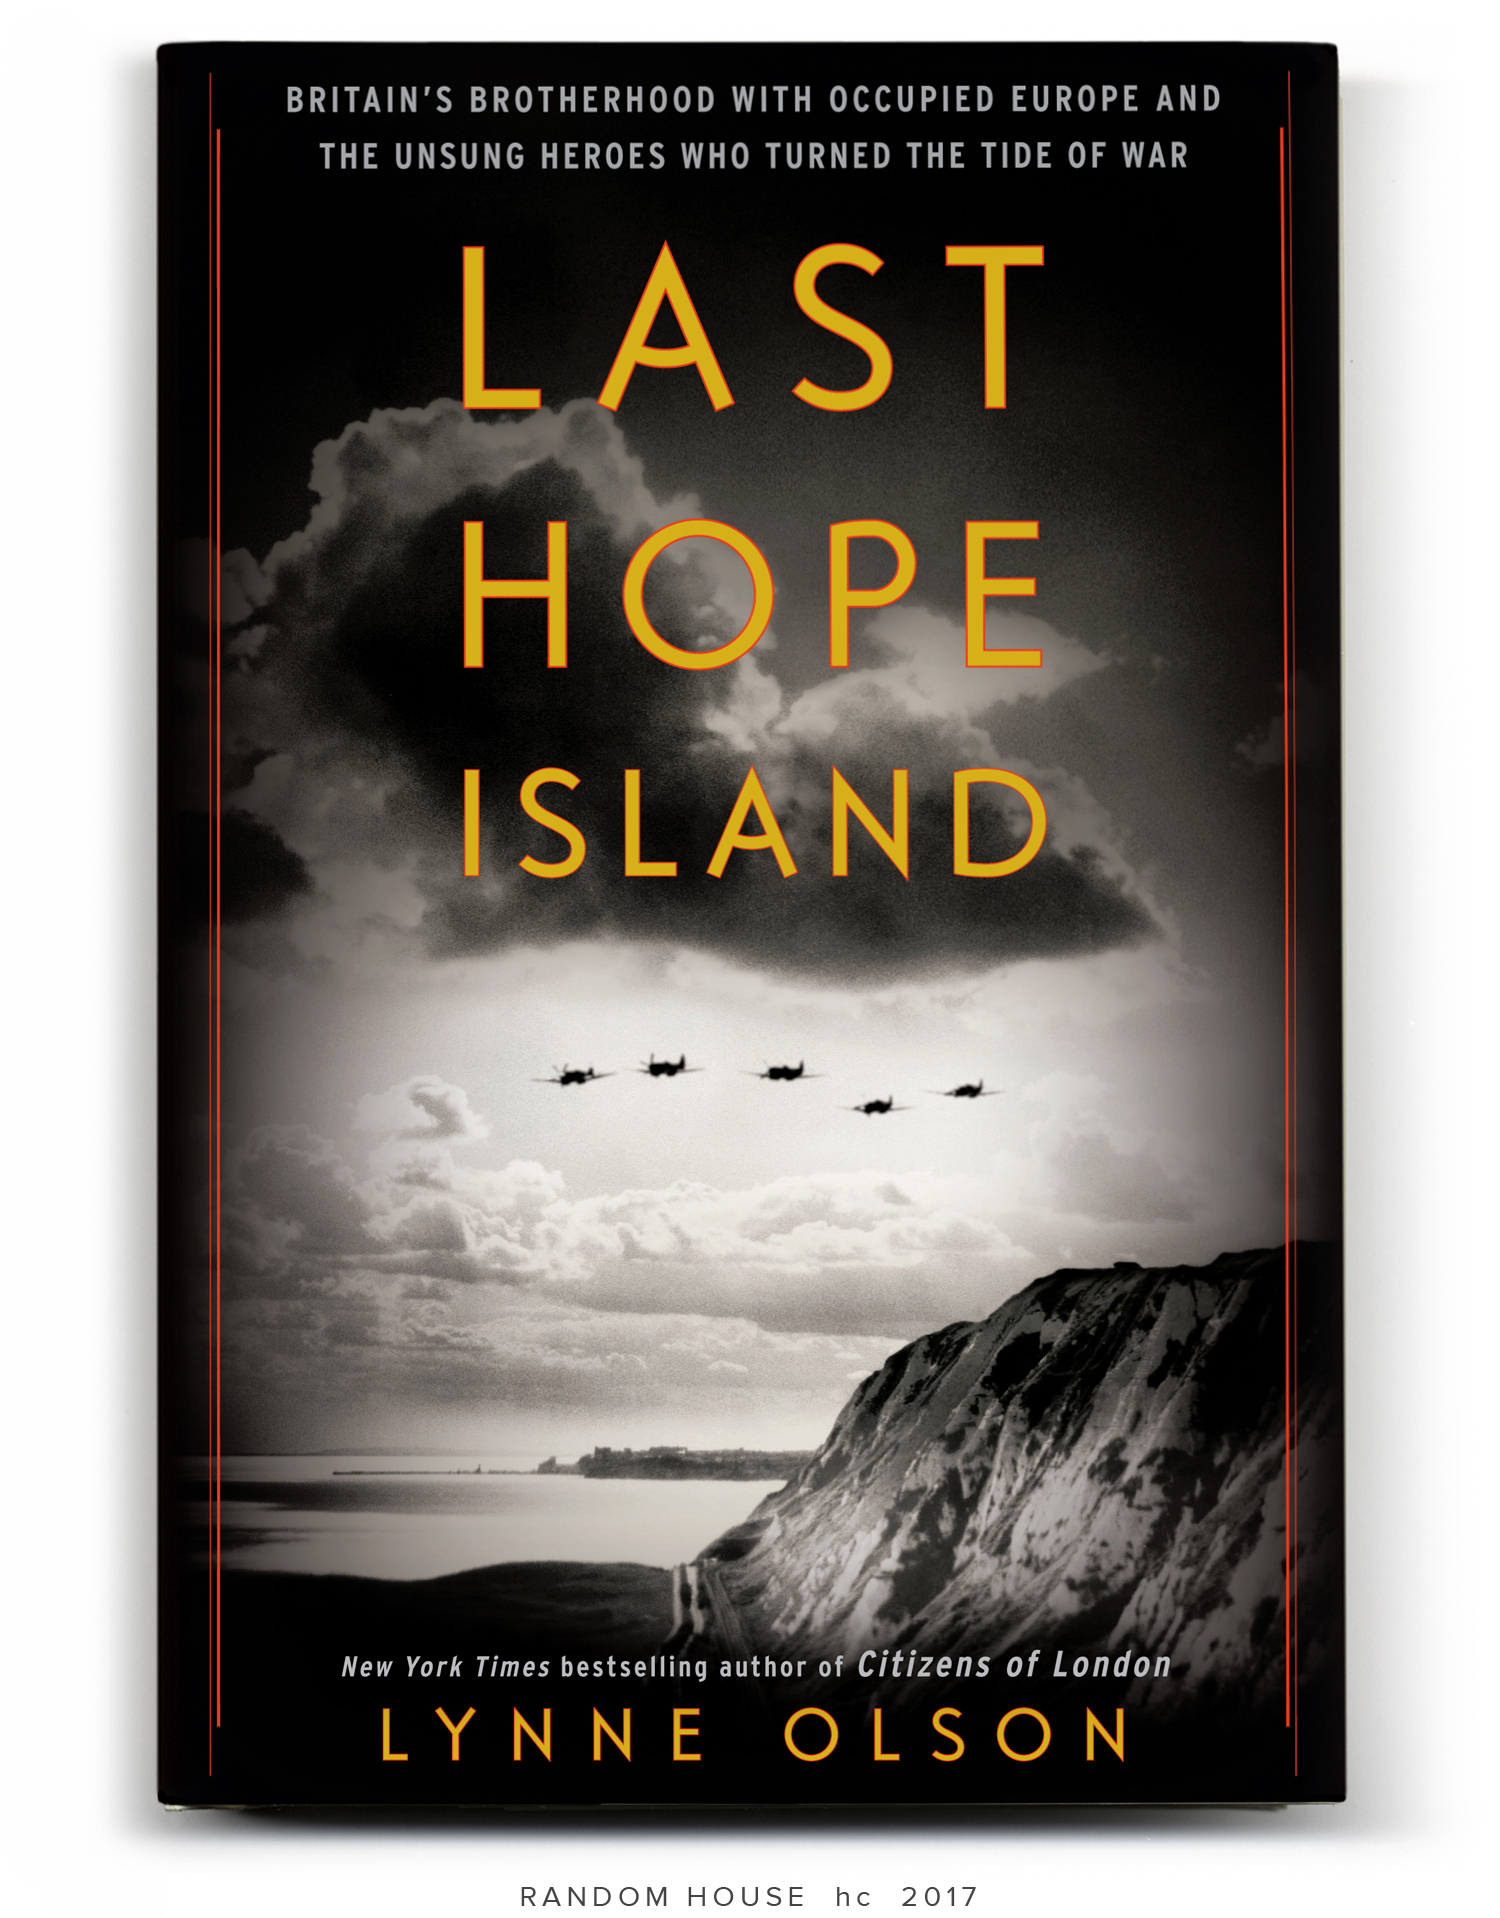 LAST-HOPE-ISLAND-hc-template-ss6v2.jpg